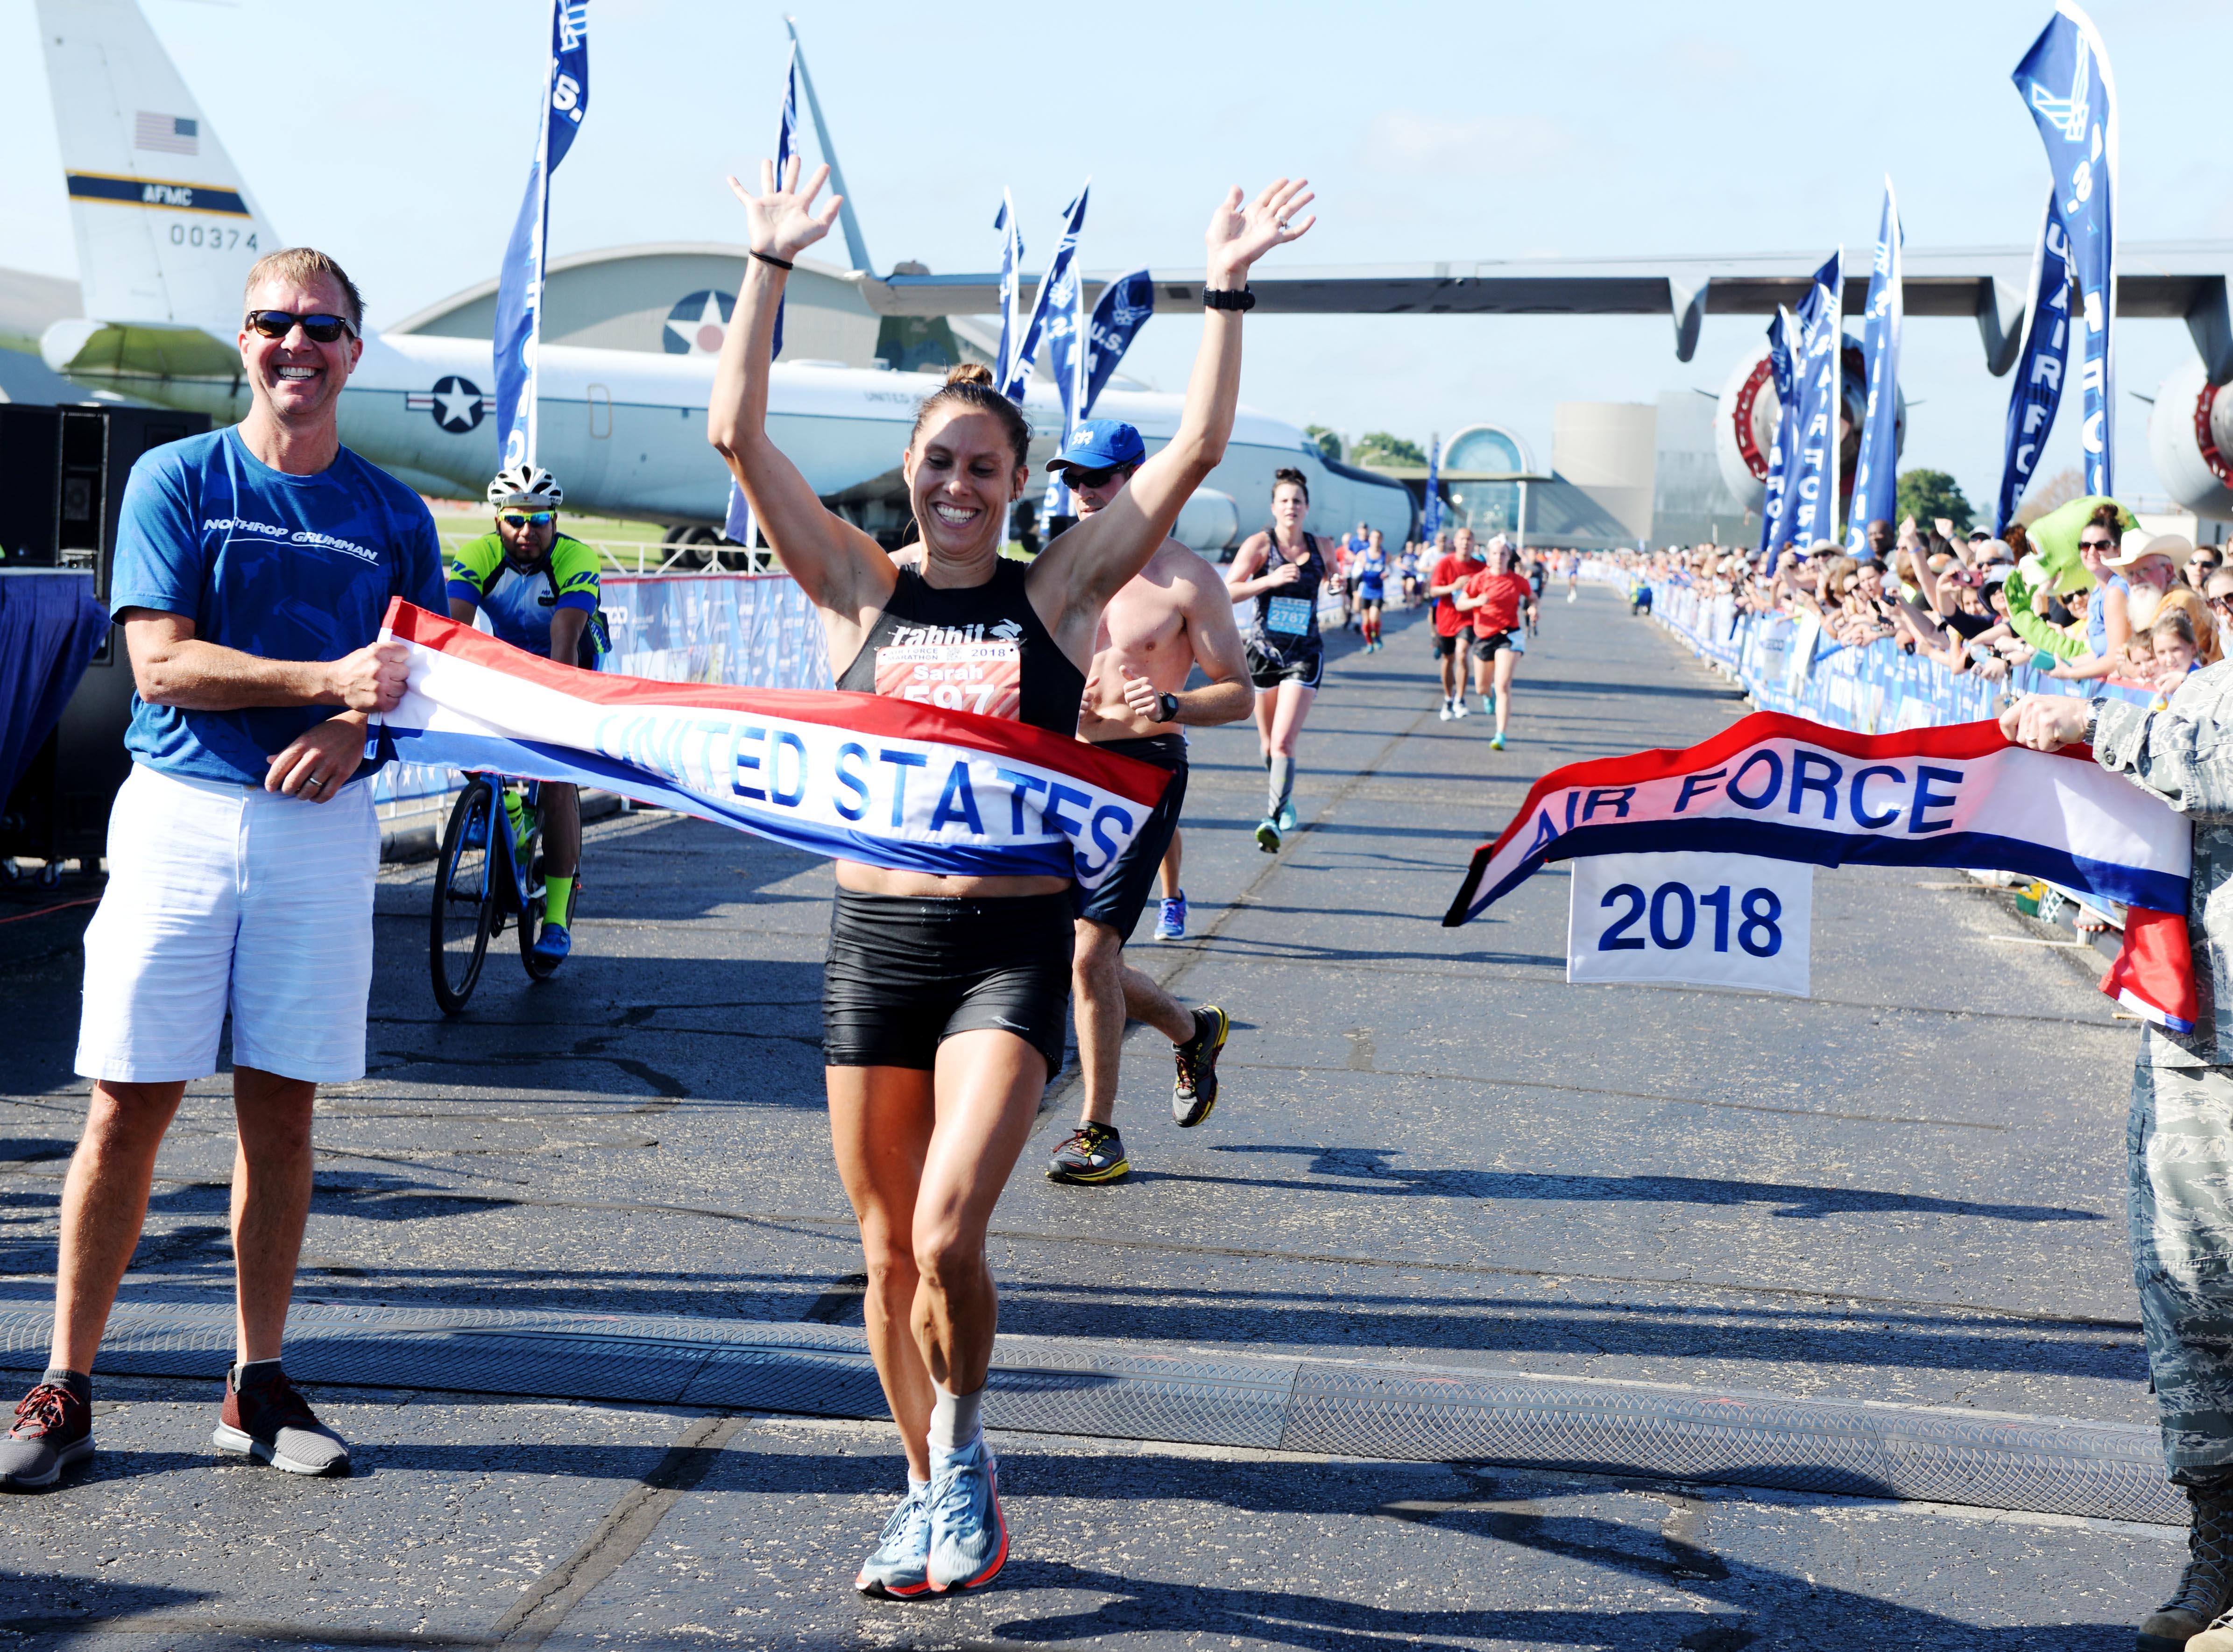 Running man cartoon background photos, 86230 background vectors.